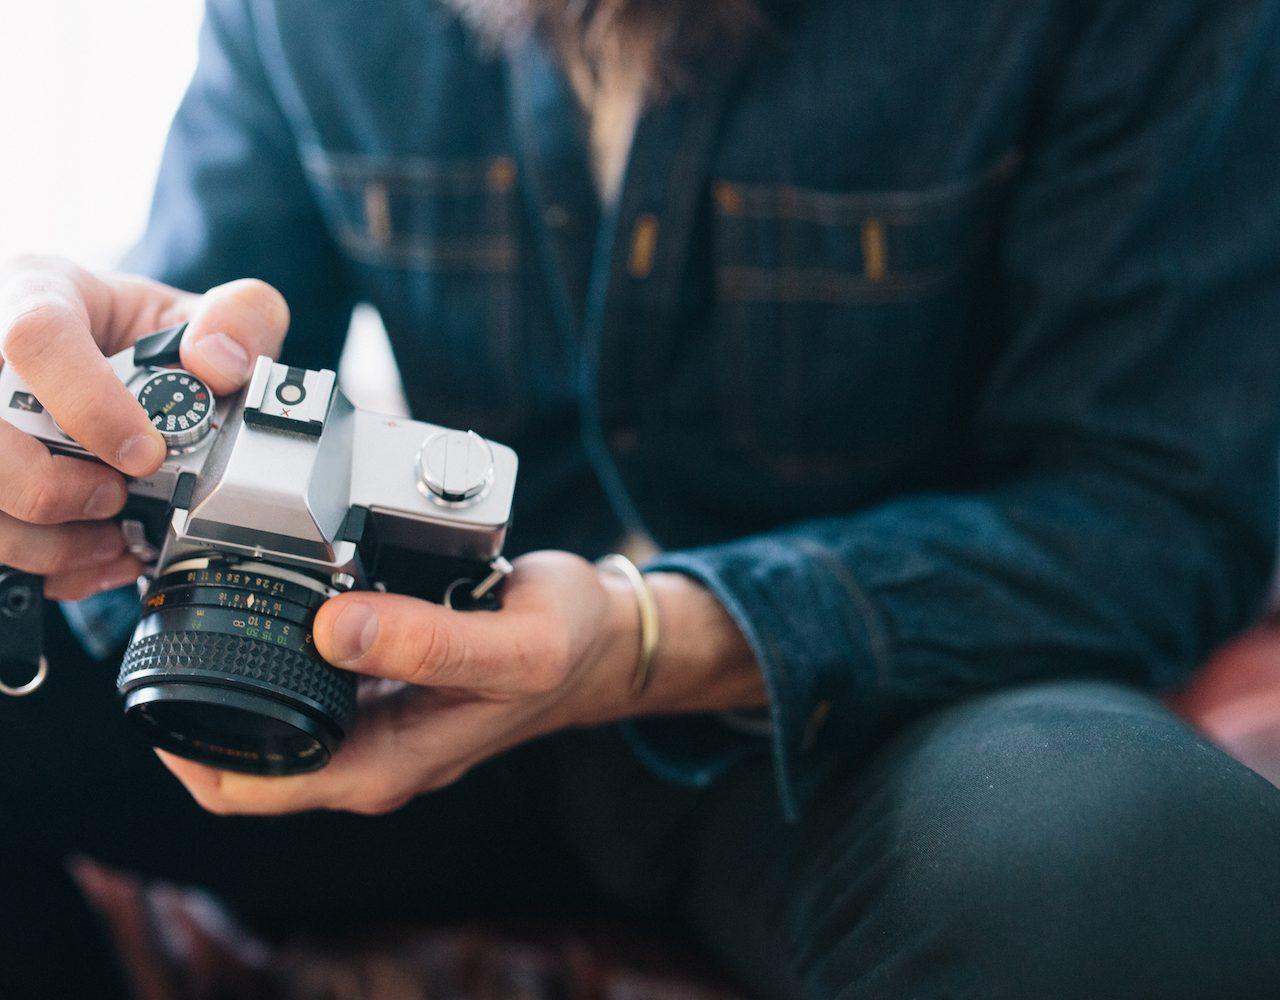 copyblogger-the-bible-of-content-marketing-danielle-molenaar